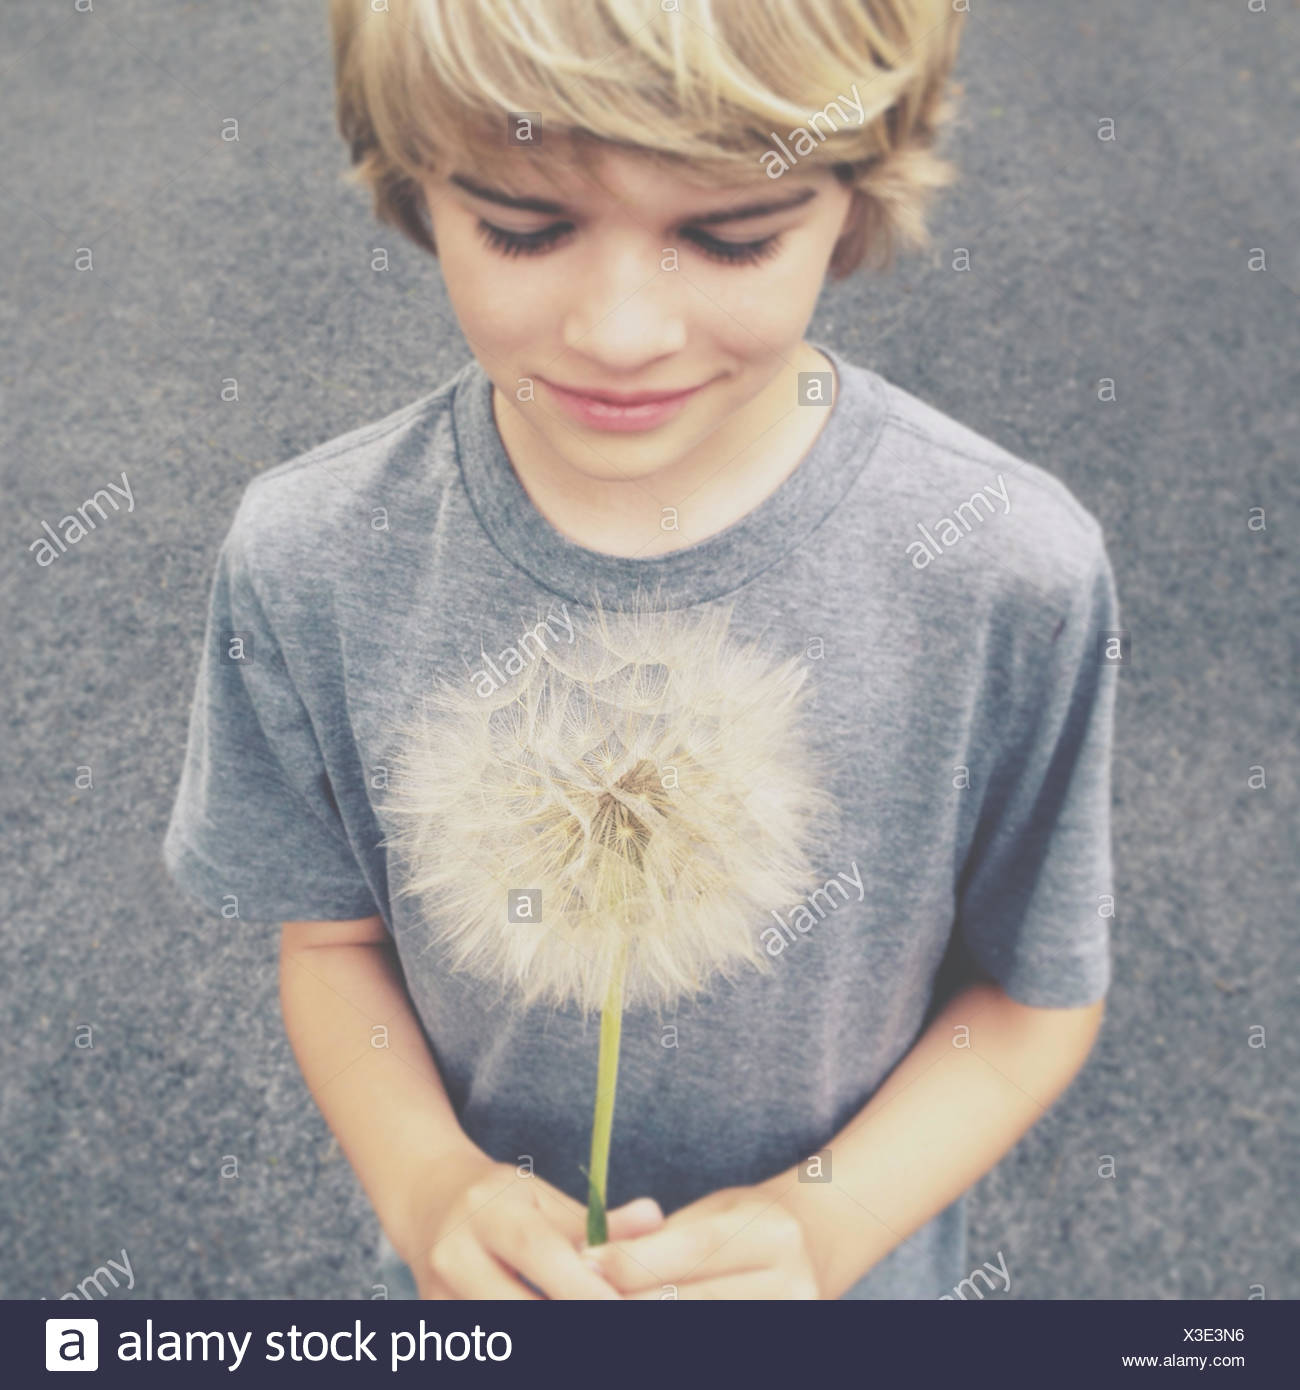 Rubio niño sosteniendo jaramago gigante Imagen De Stock